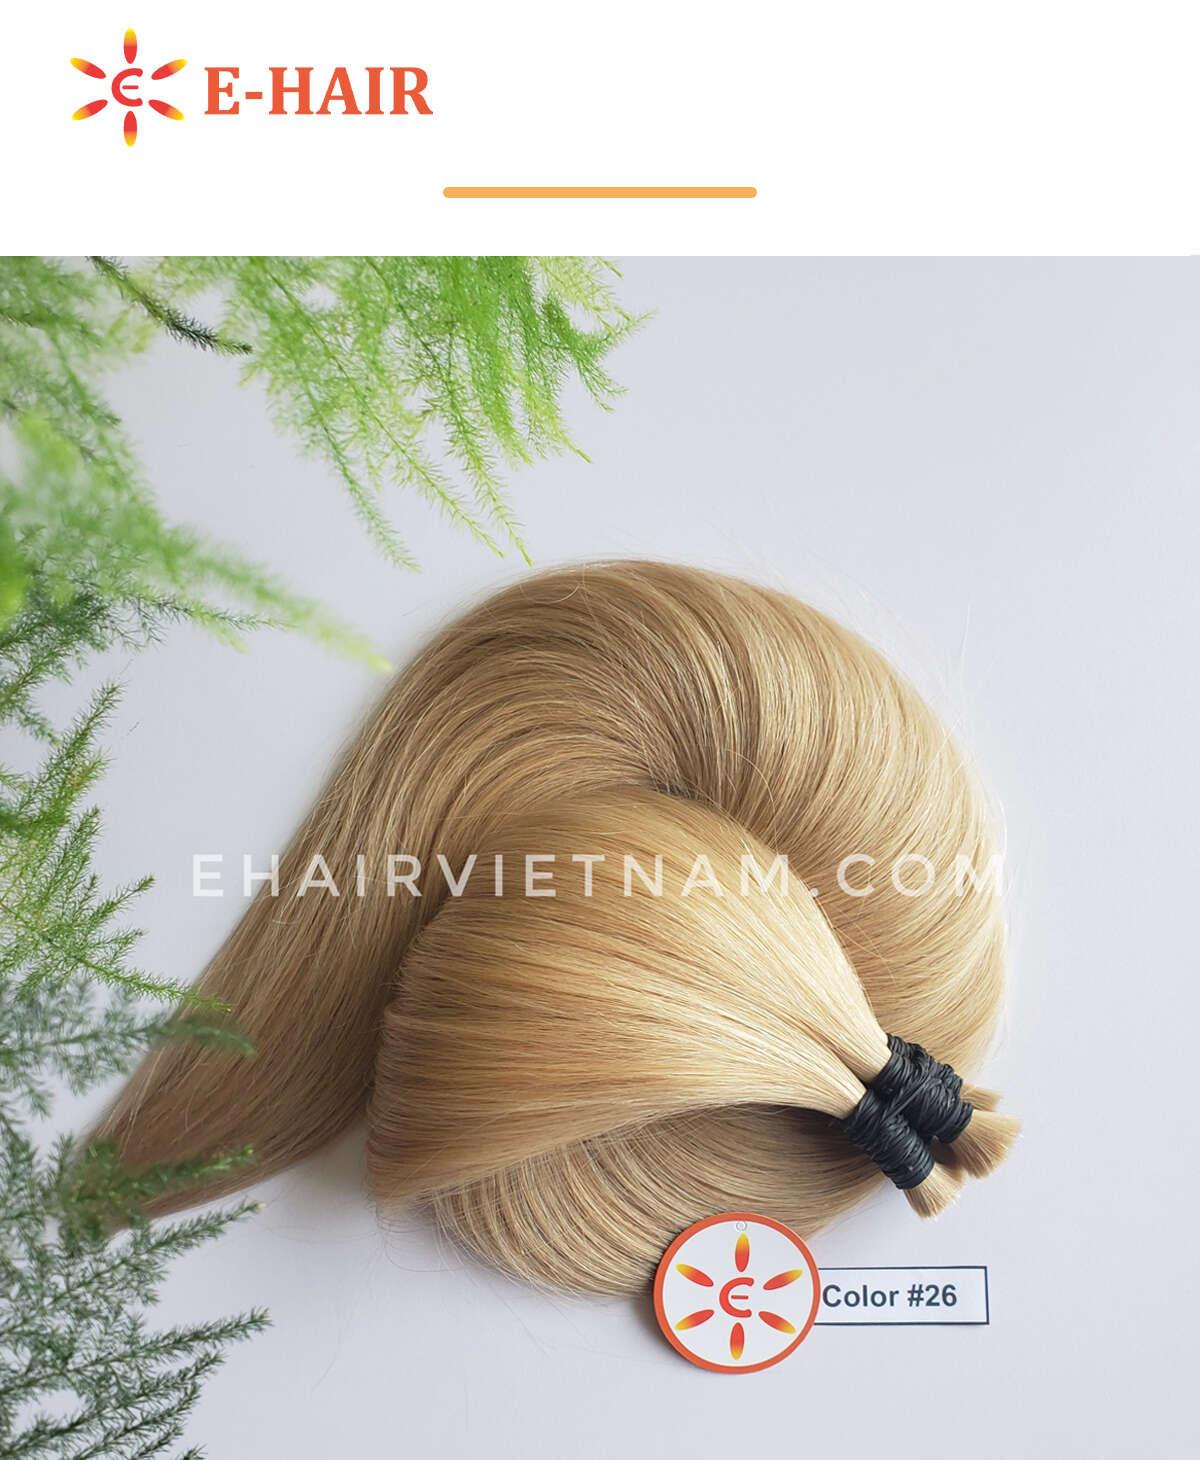 ehairvietnam, hair, wigs, vietnam hair, natural hair, export hair